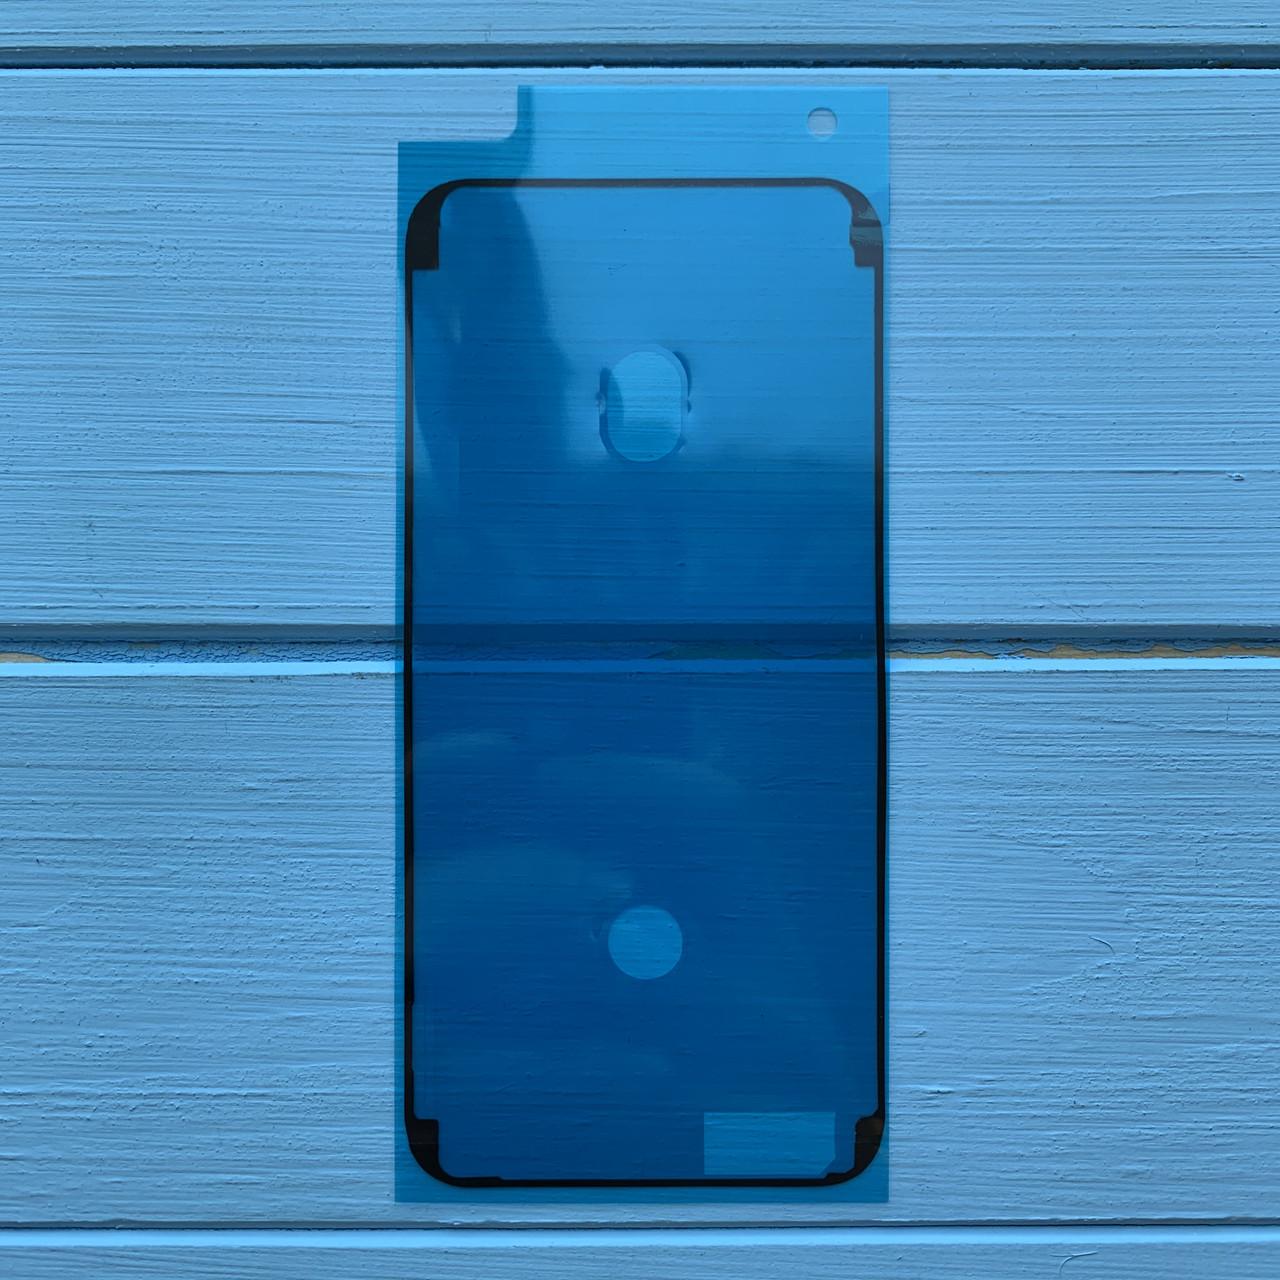 Стикер-проклейка (двухсторонний скотч) дисплея Apple iPhone 6S Black